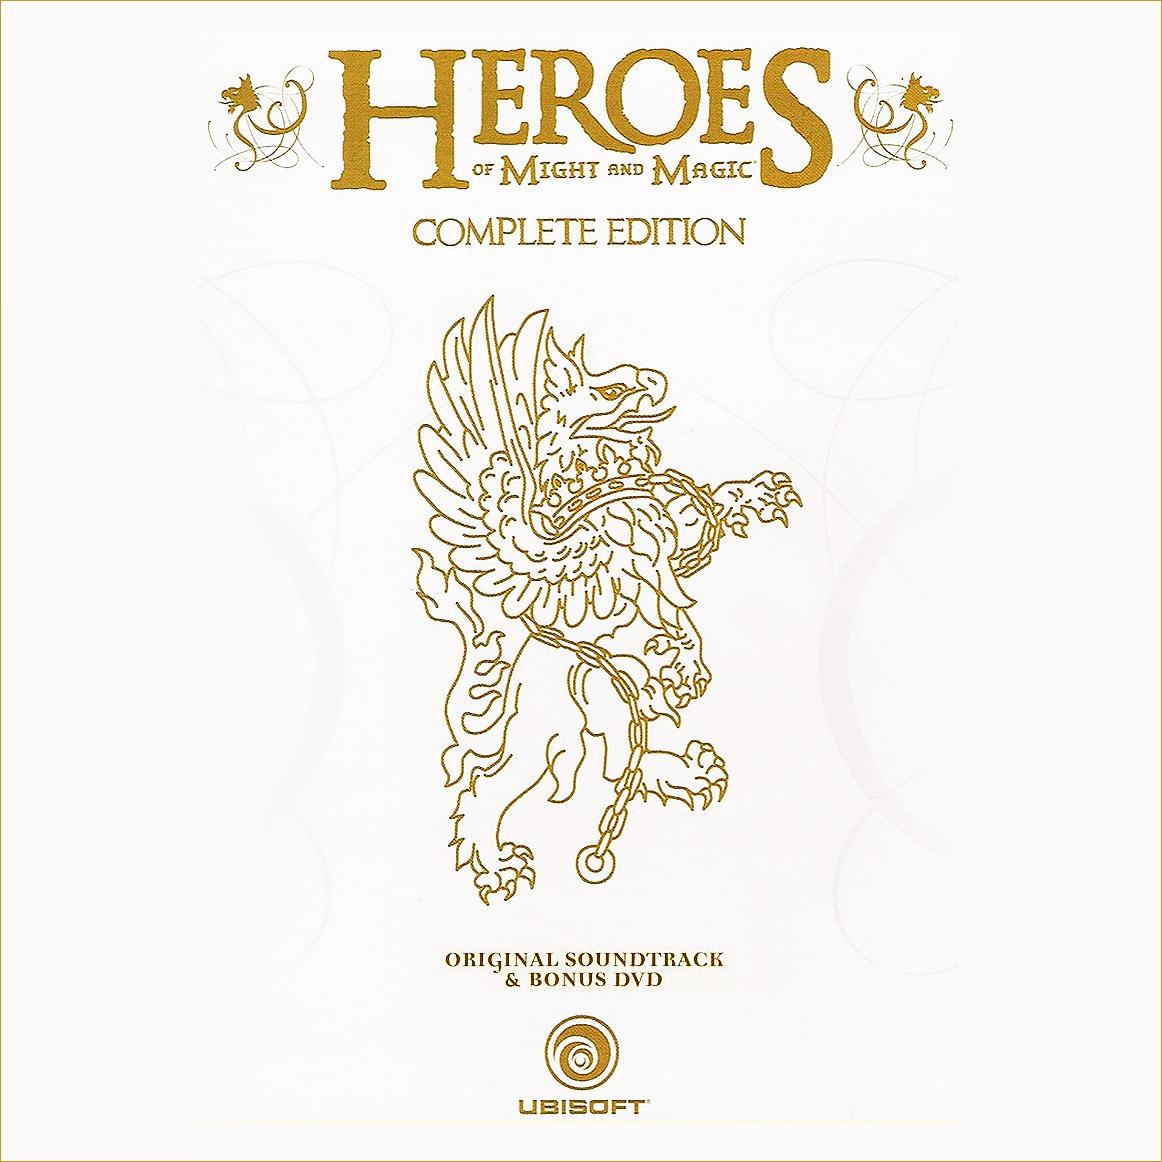 Саундтрек/Soundtrack Heroes of Might and Magic V | Paul Romero, Rob King (2007) Герои меча и магии 5 | Пол Ромеро, Роб Кинг